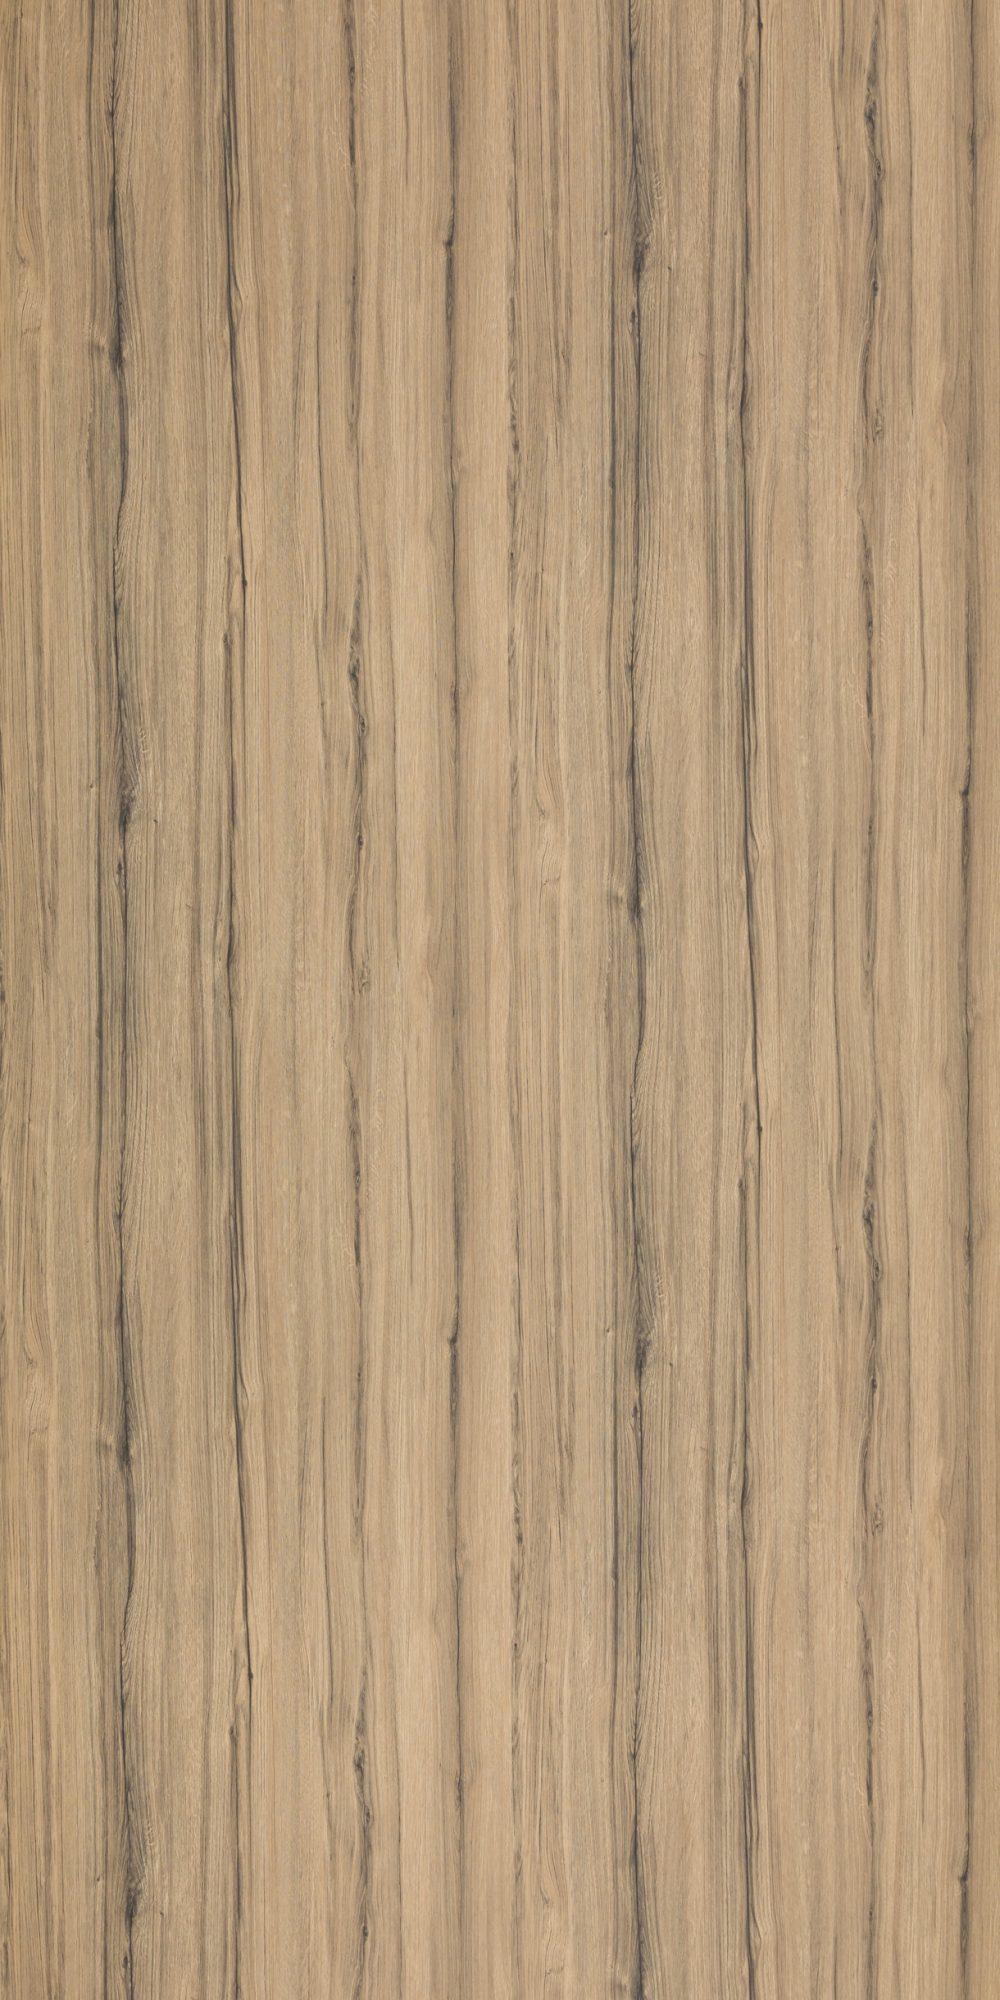 HPL Specials - Zebrano Wood